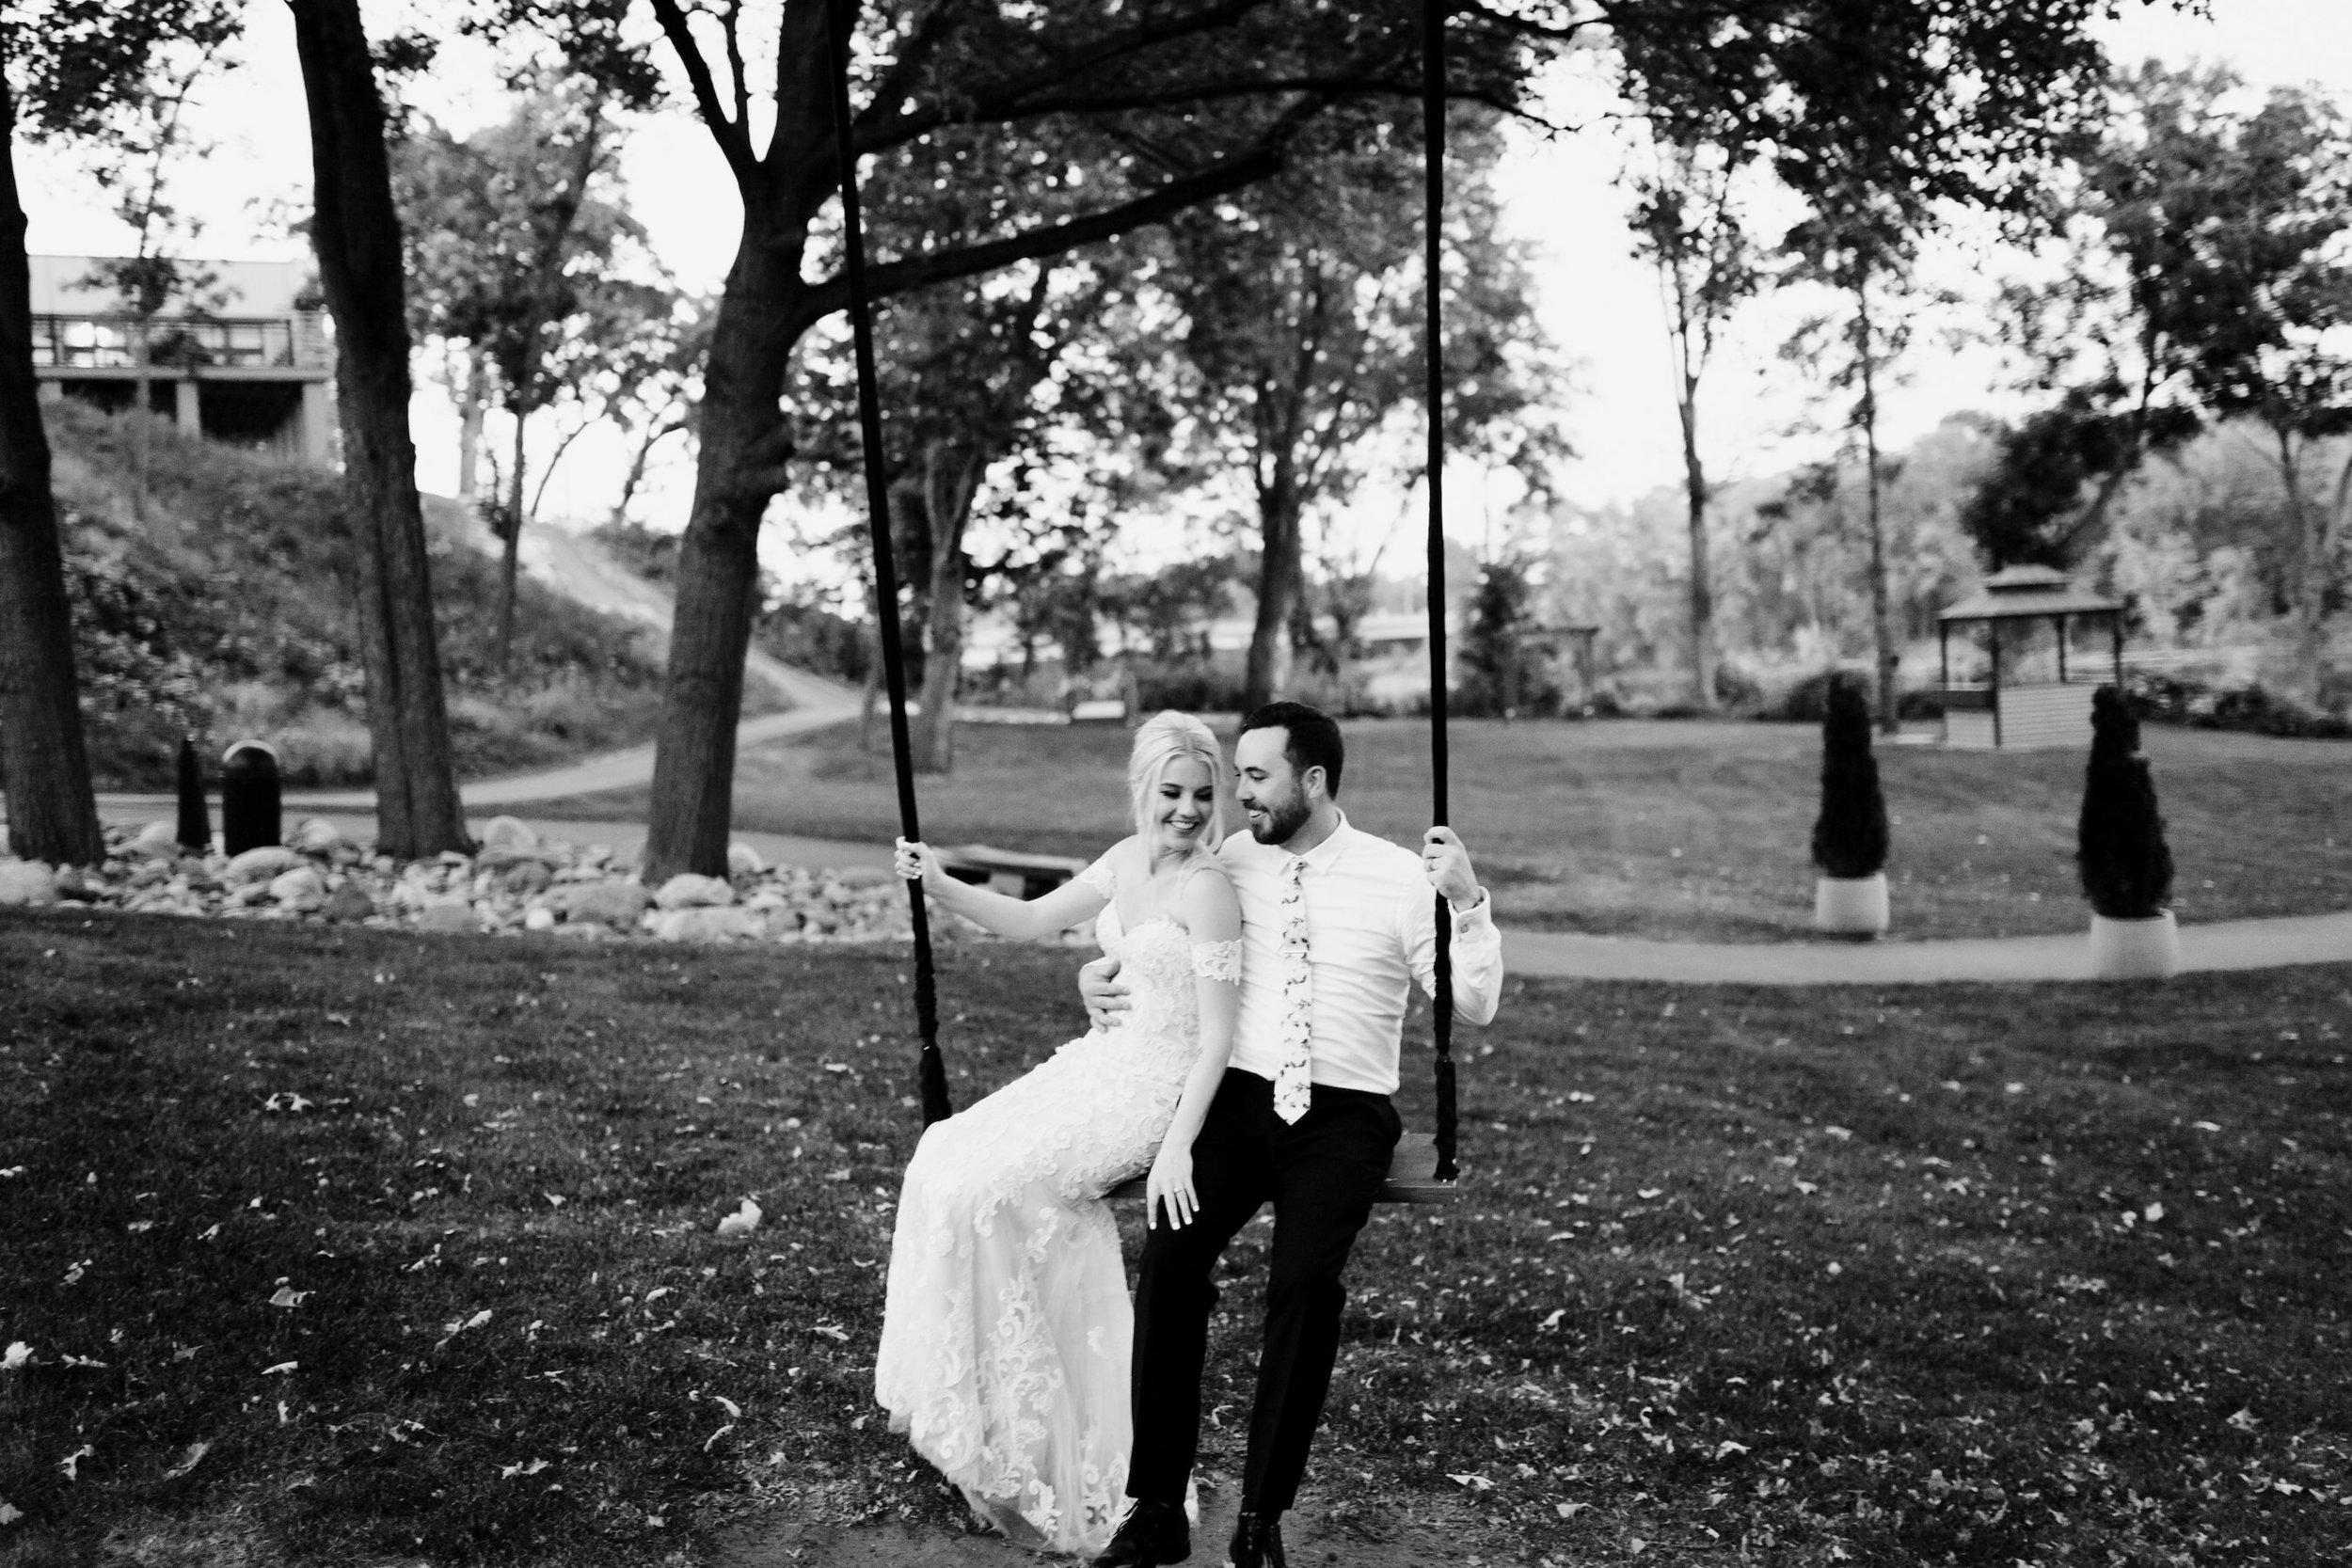 engle-olson-april-cj-wedding-jessica-holleque-18.jpg